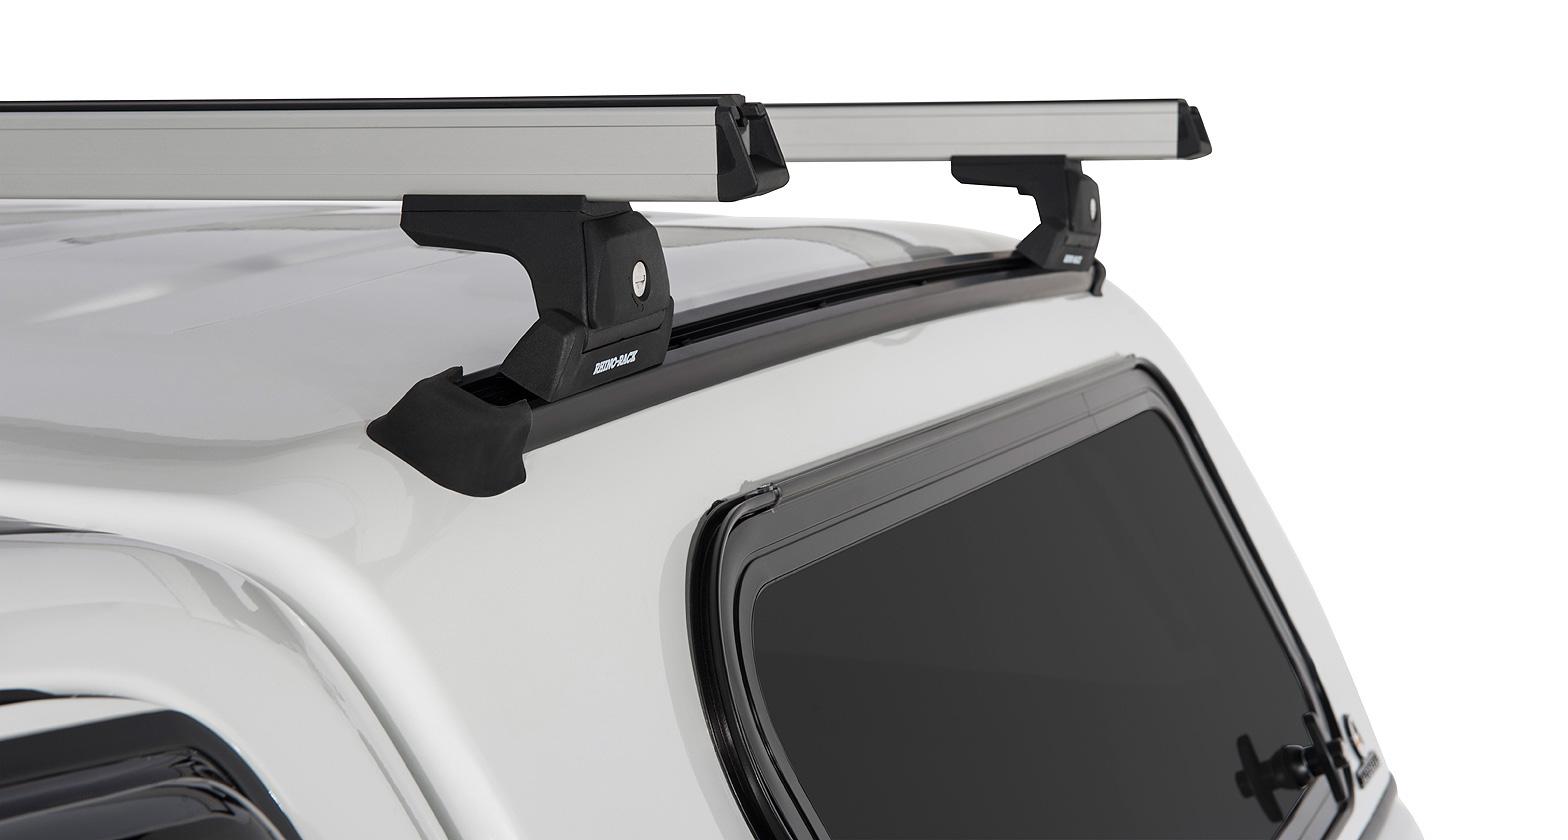 Auto Nexus Canopy - Heavy Duty RLT600 Silver 2 Bar Roof Rack | Rhino-Rack  sc 1 st  Rhino-Rack & Heavy Duty RLT600 Canopy Roof Rack | Rhino-Rack